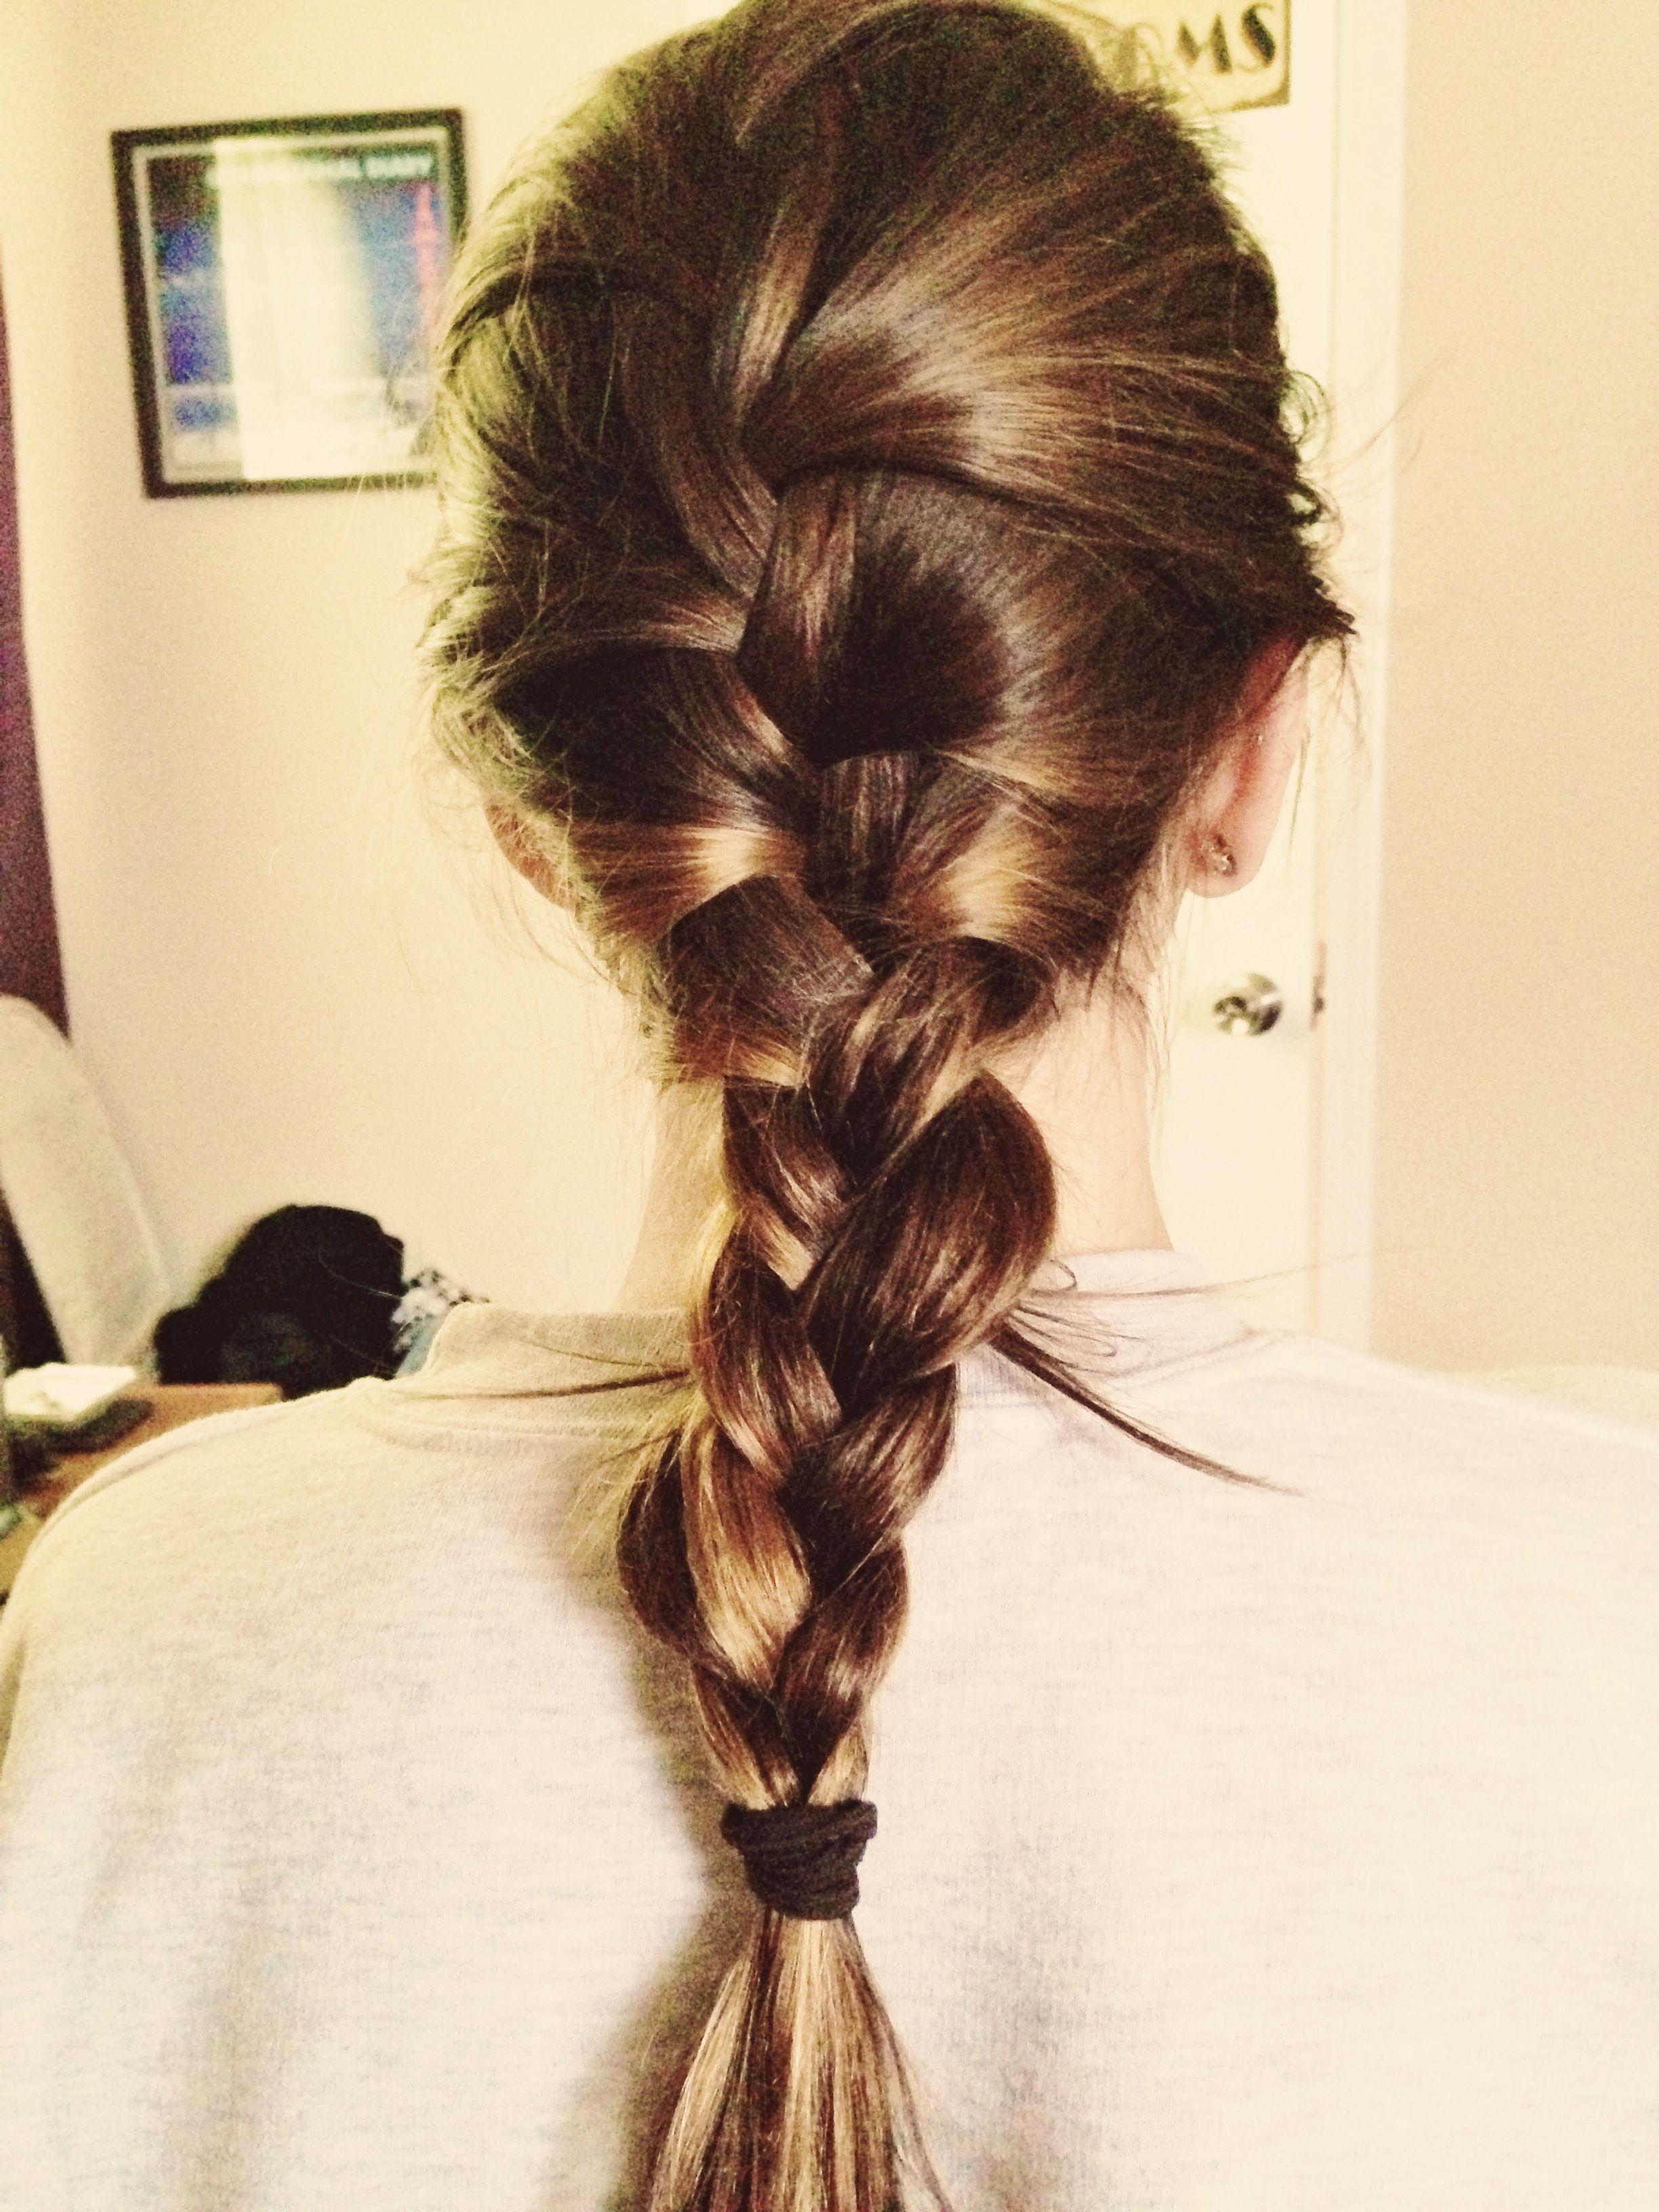 French braid...LOVE.